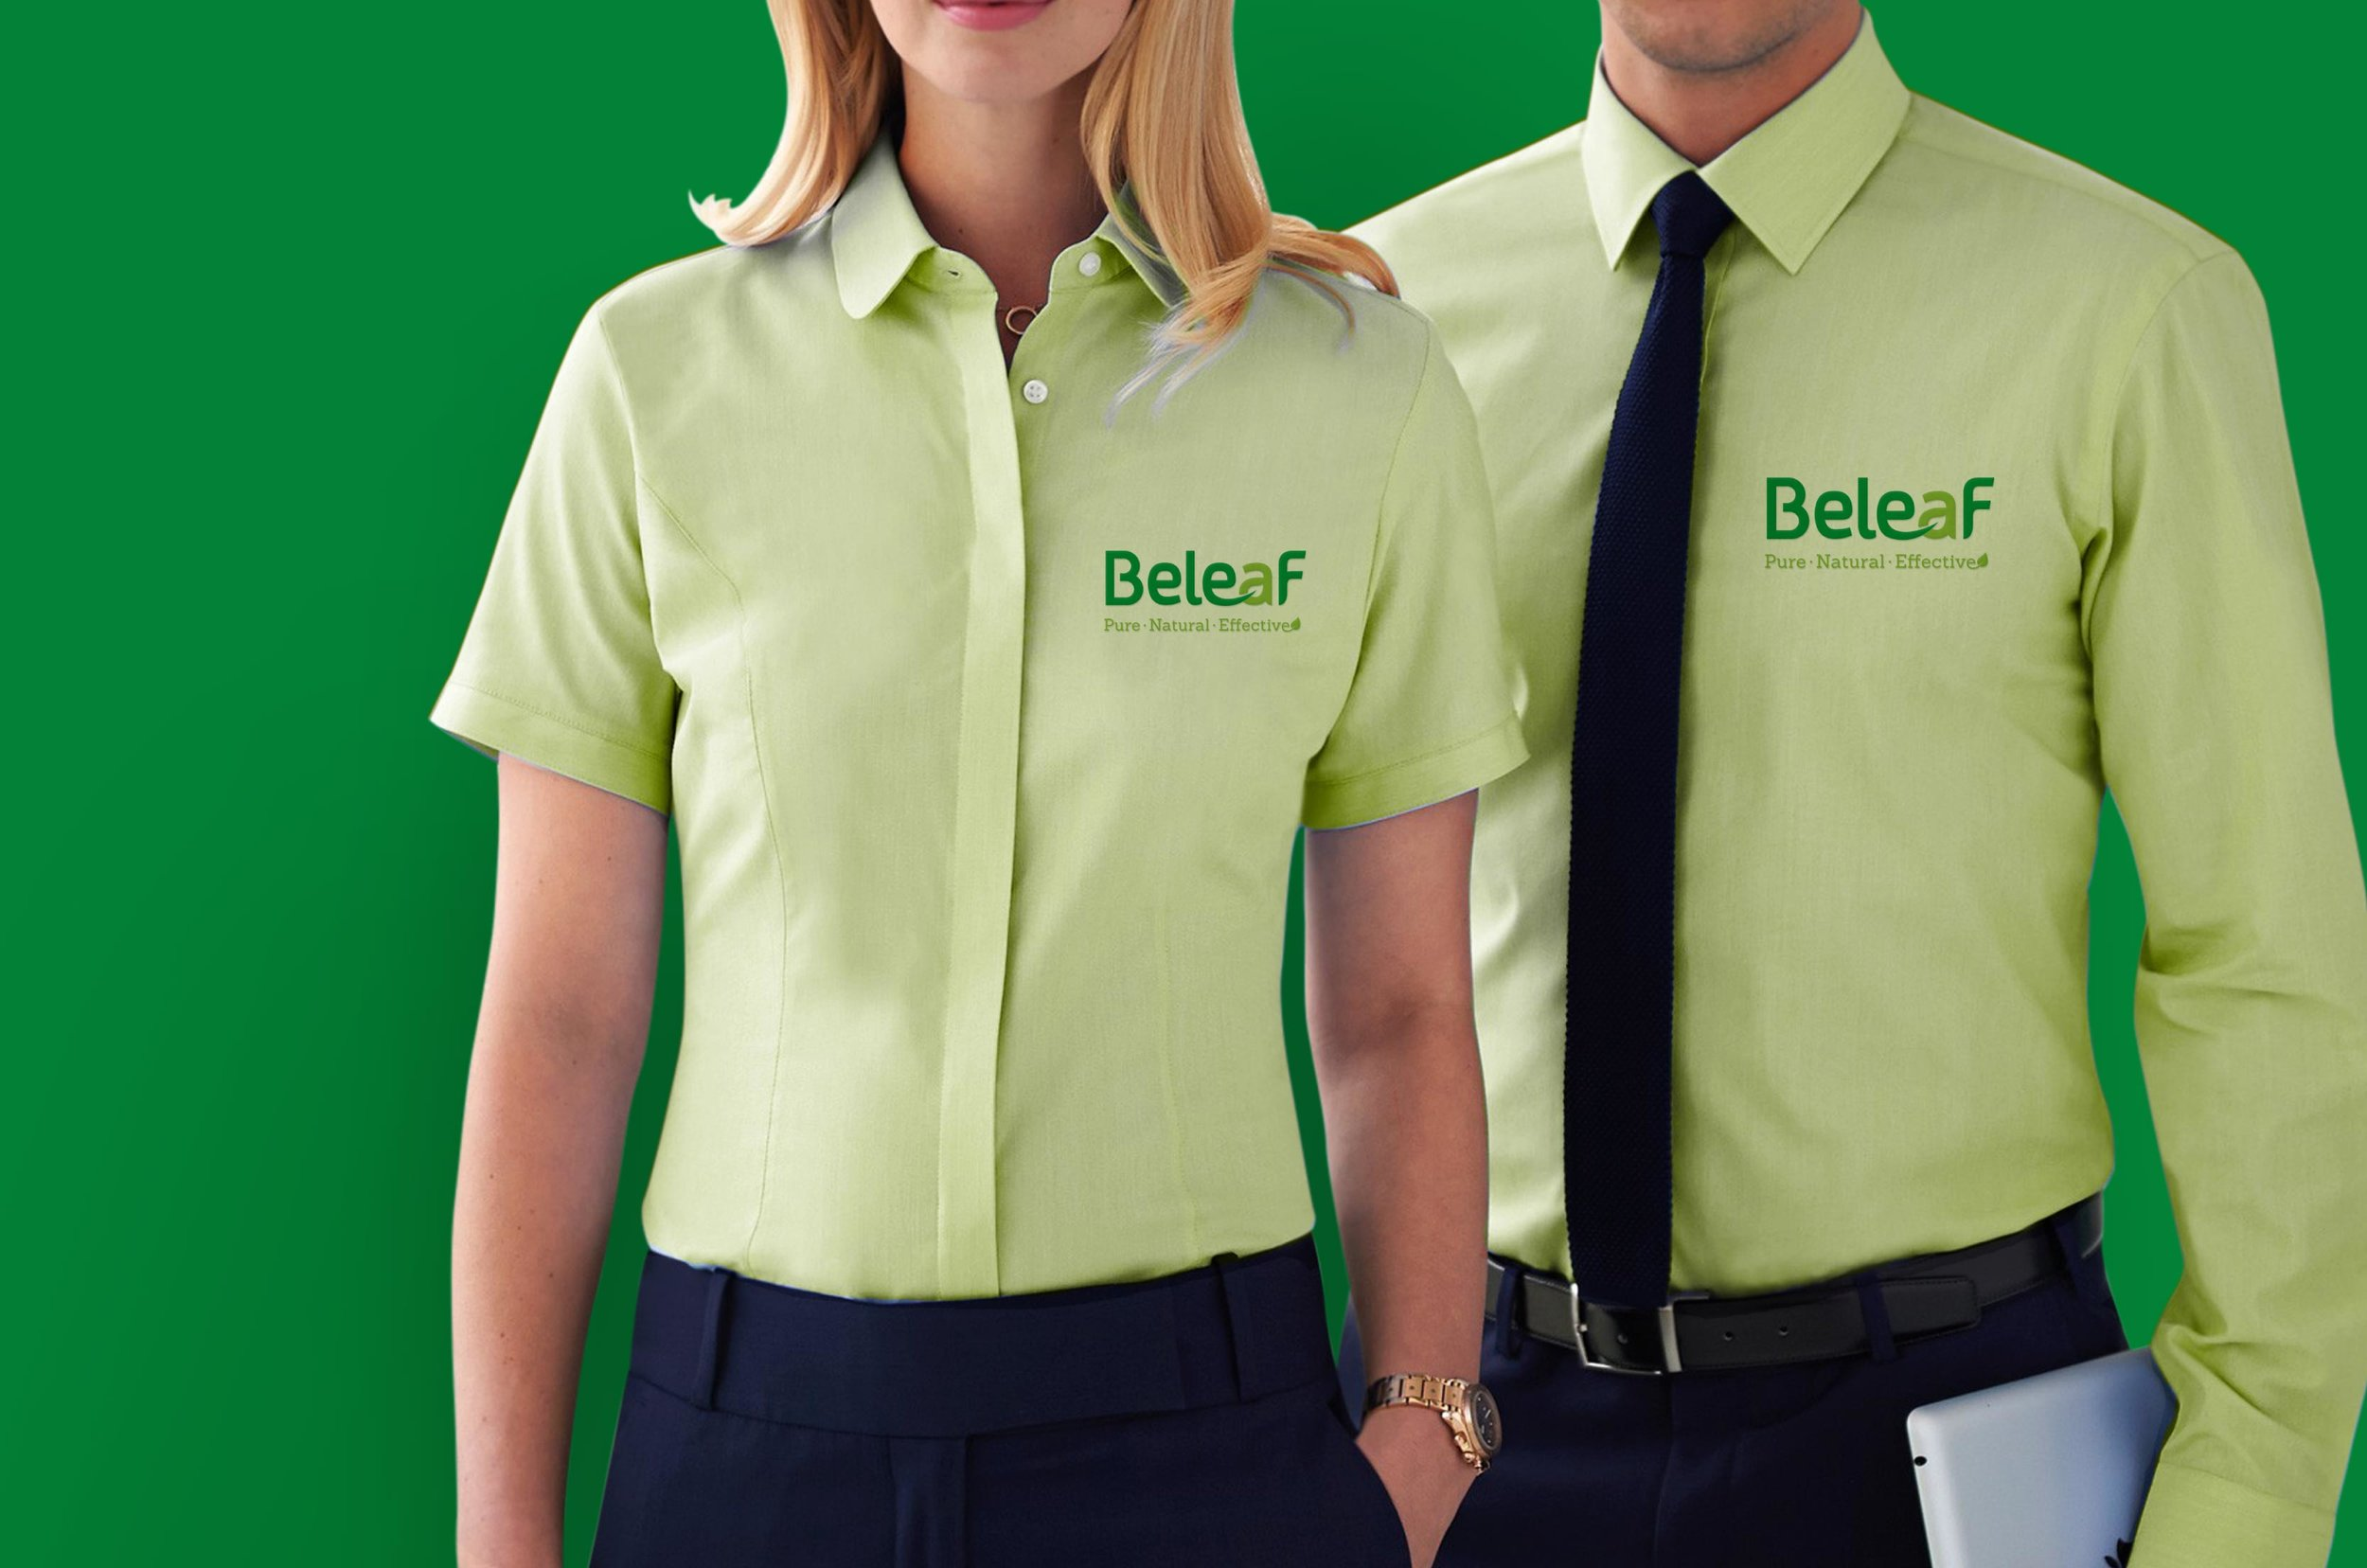 Beleaf_Branding_Elephant Design 3.jpg